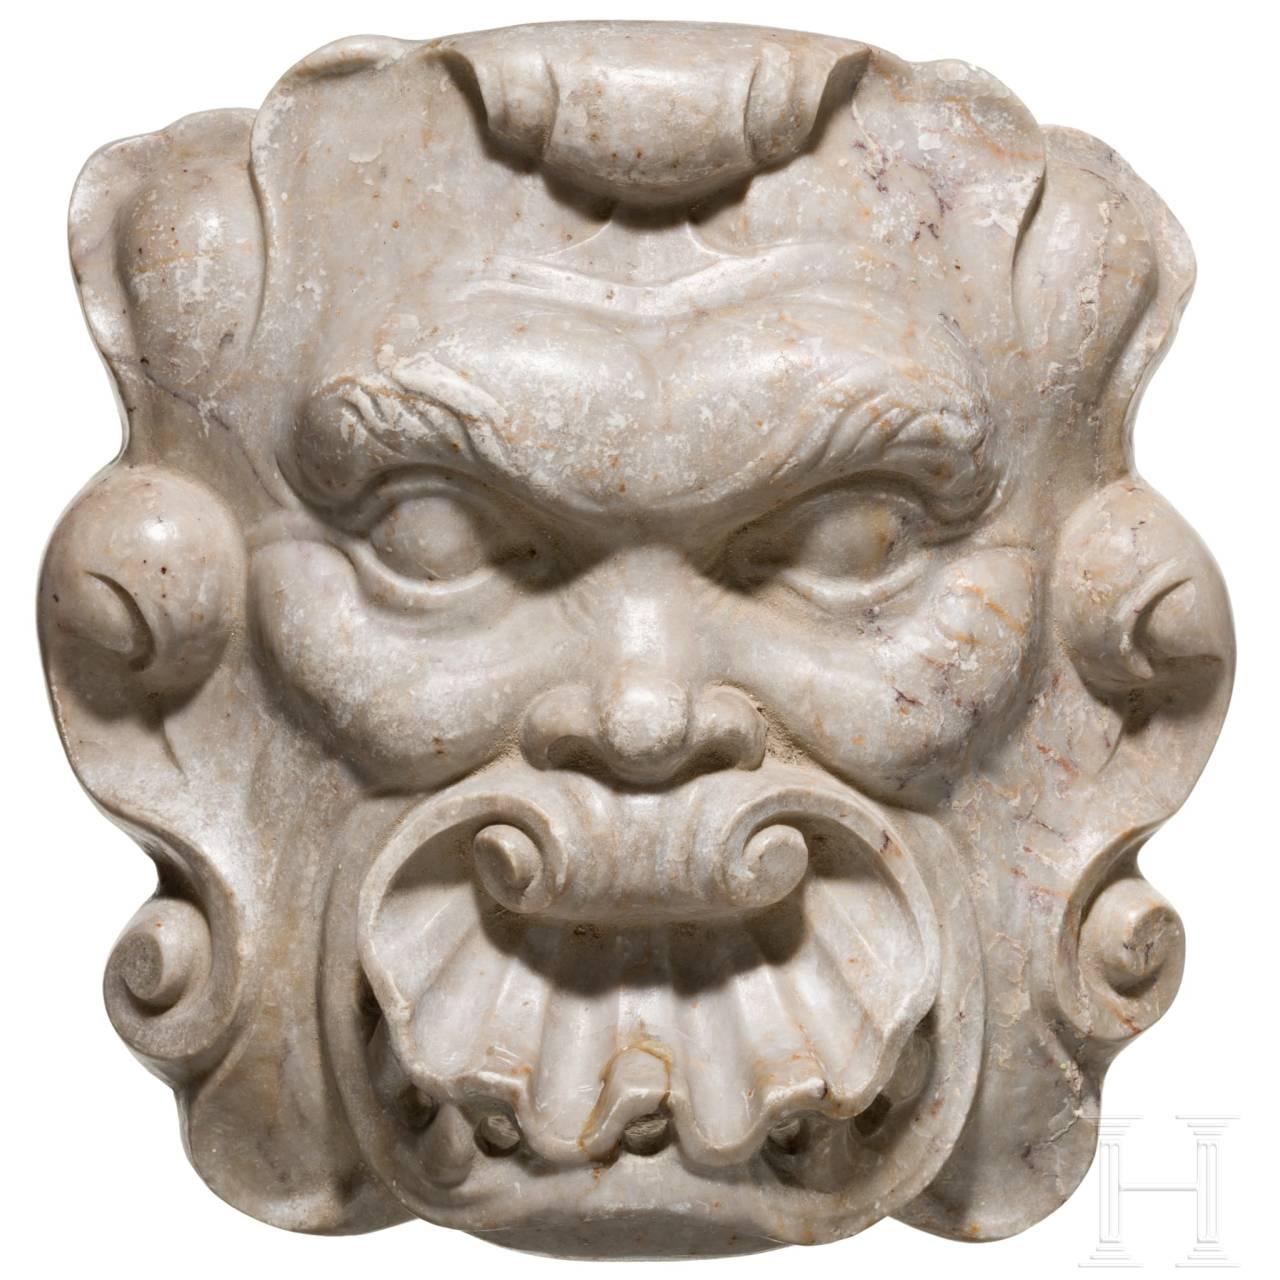 Barock-Brunnenmaske aus Marmor, Spanien, 17. Jhdt.